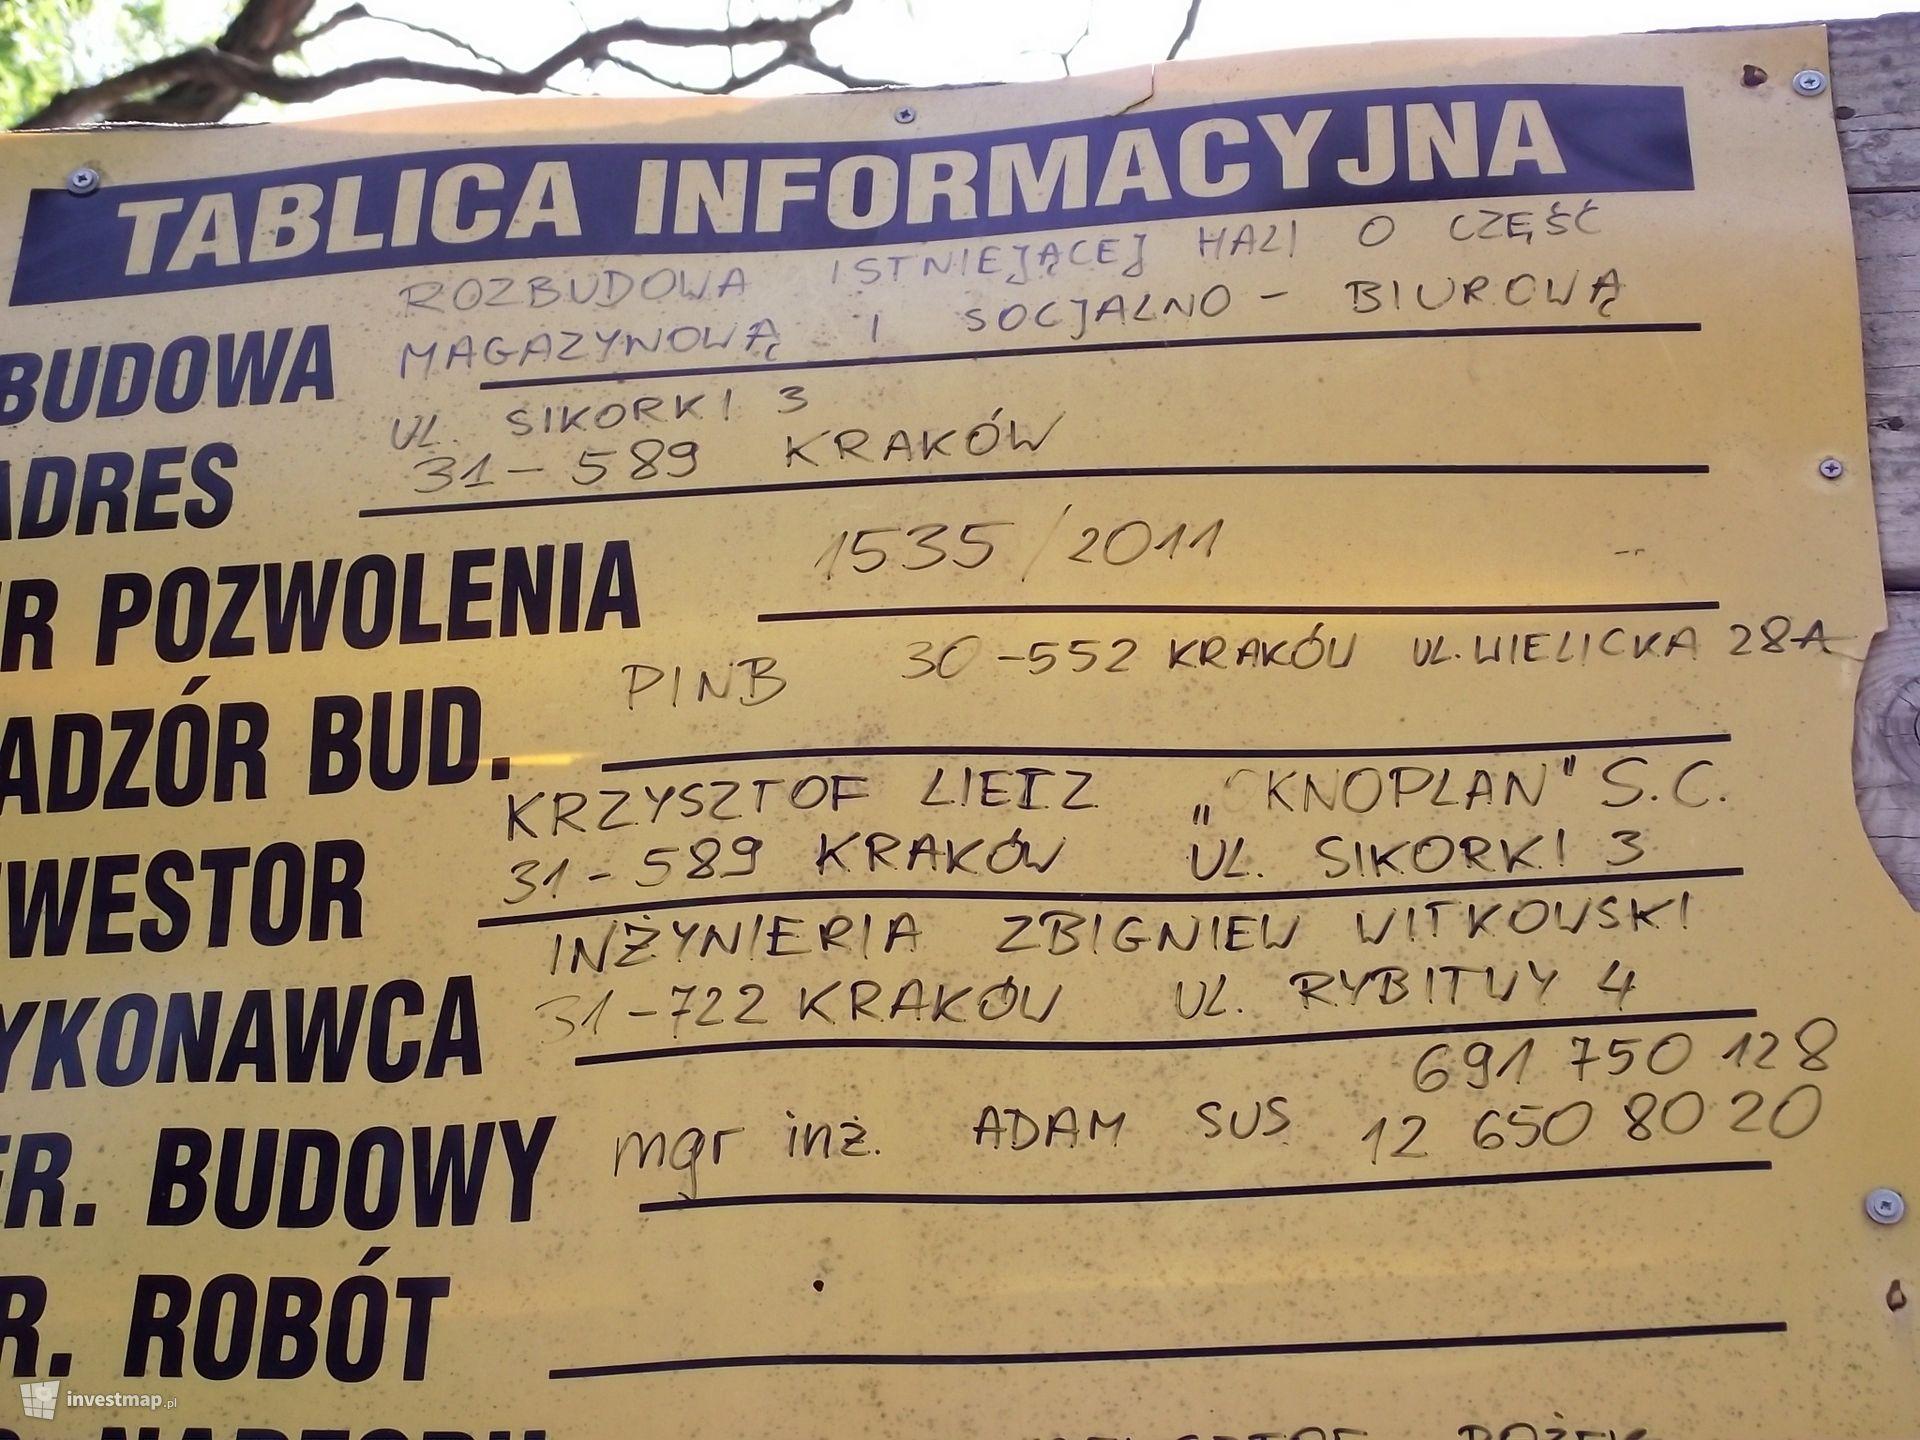 Hala Magazynowo - Biurowa Ul. Sikorki  3